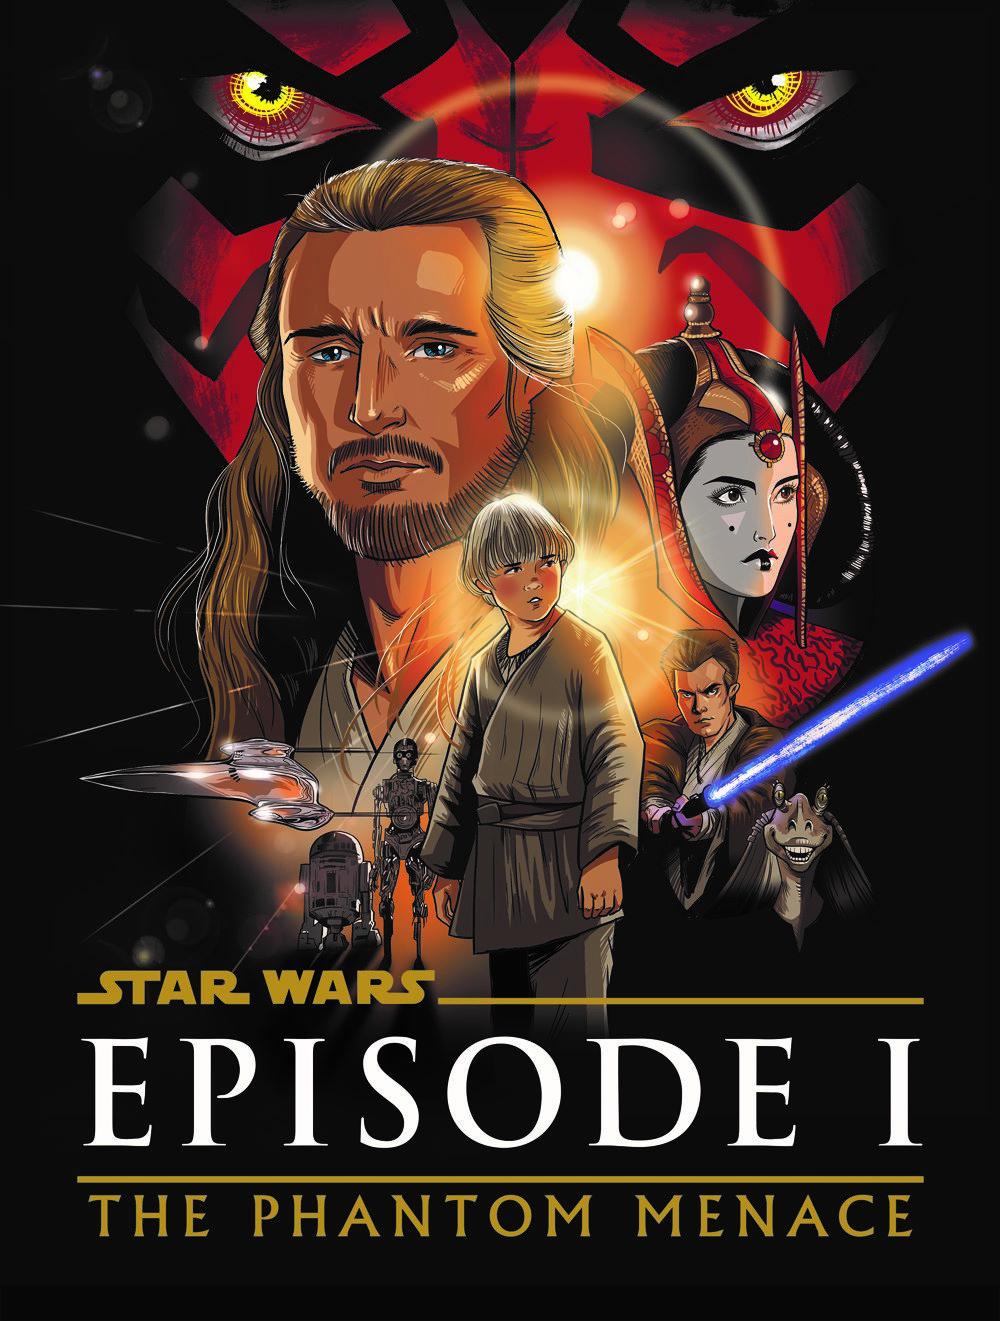 SW_ThePhantomMenace-mock ComicList Previews: STAR WARS THE PHANTOM MENACE GRAPHIC NOVEL ADAPTATION GN